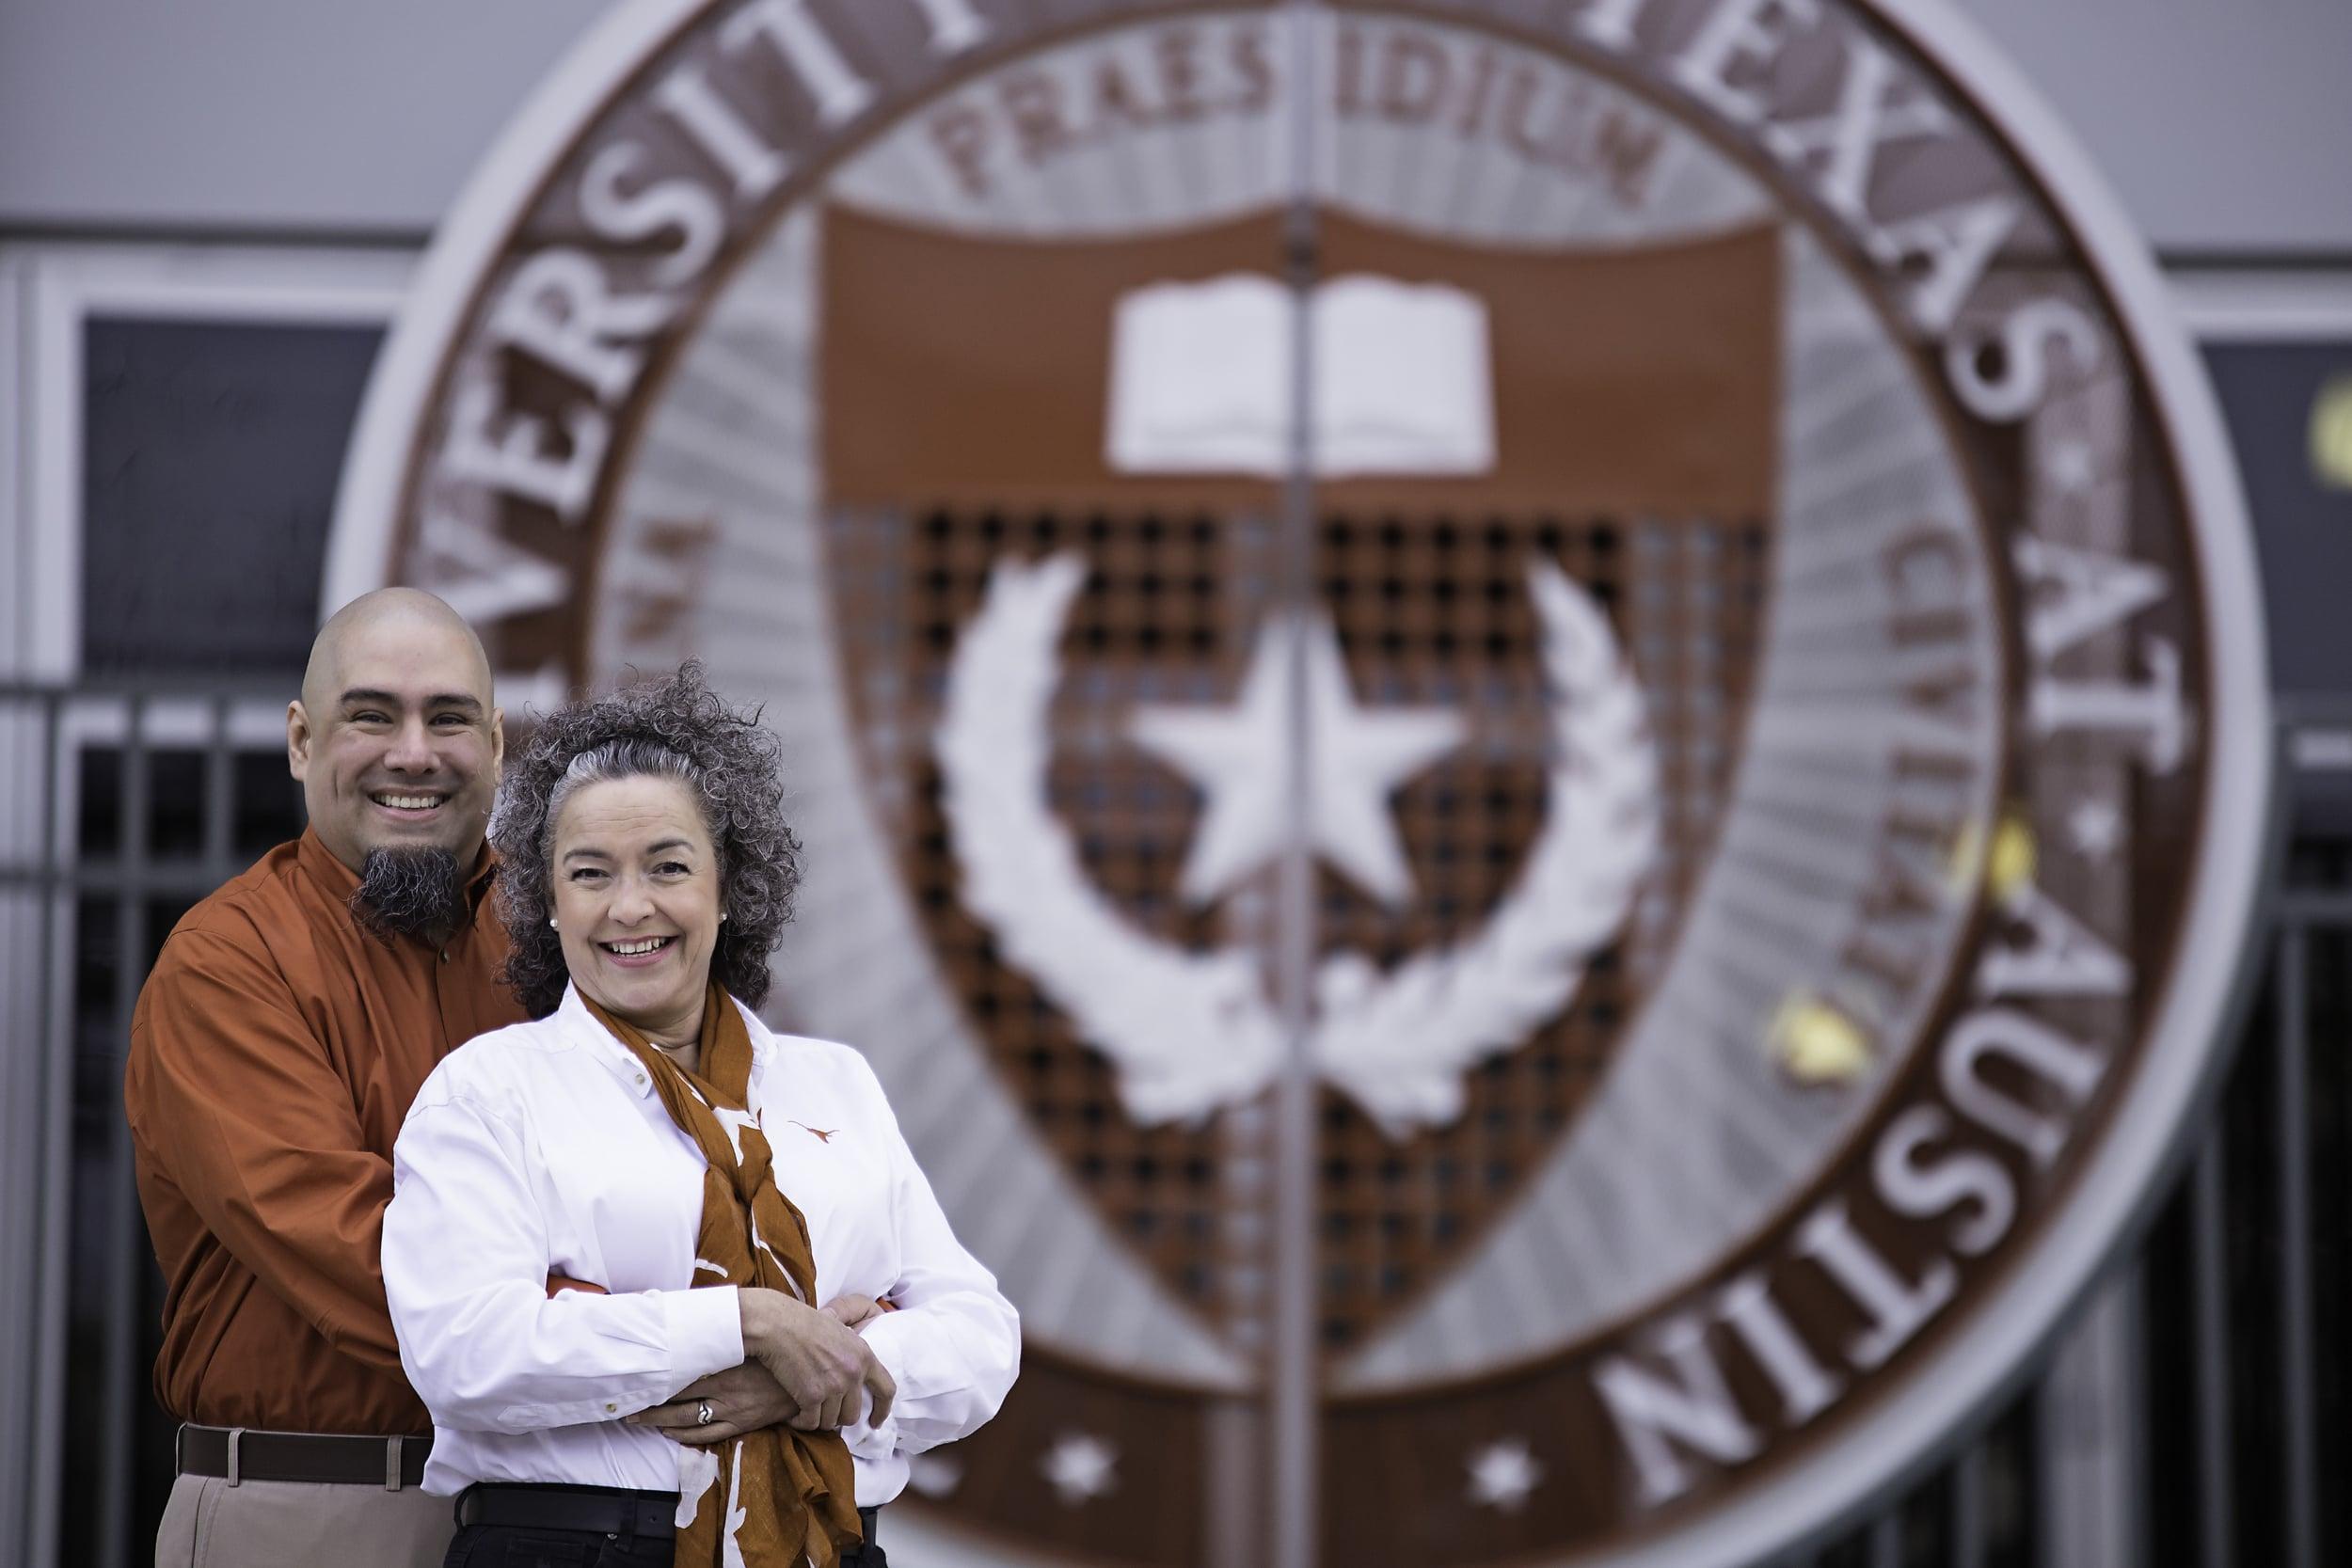 University_Texas_Engagement_Session_01